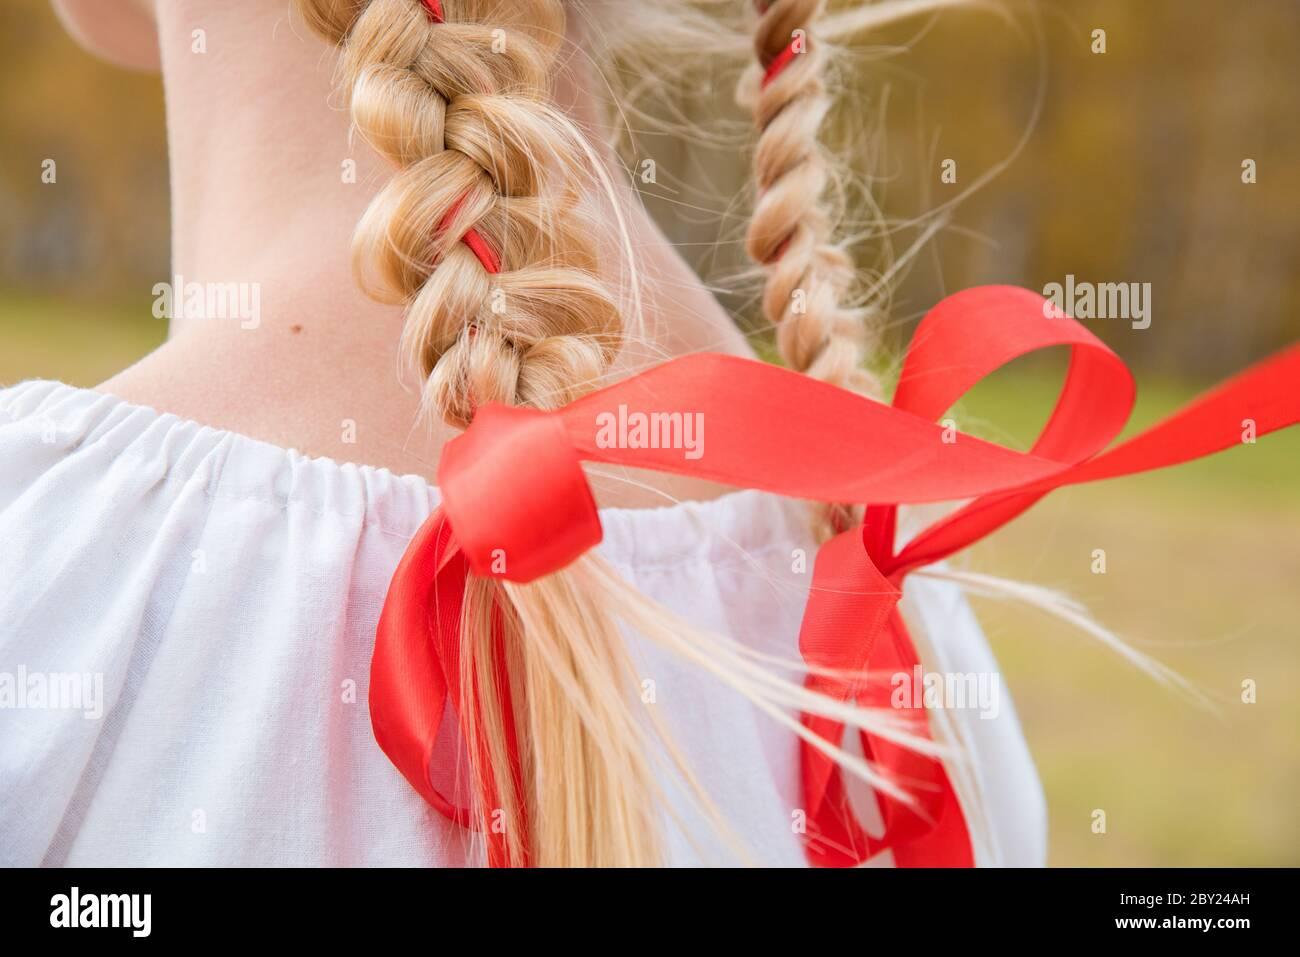 blonde russische schonheiten